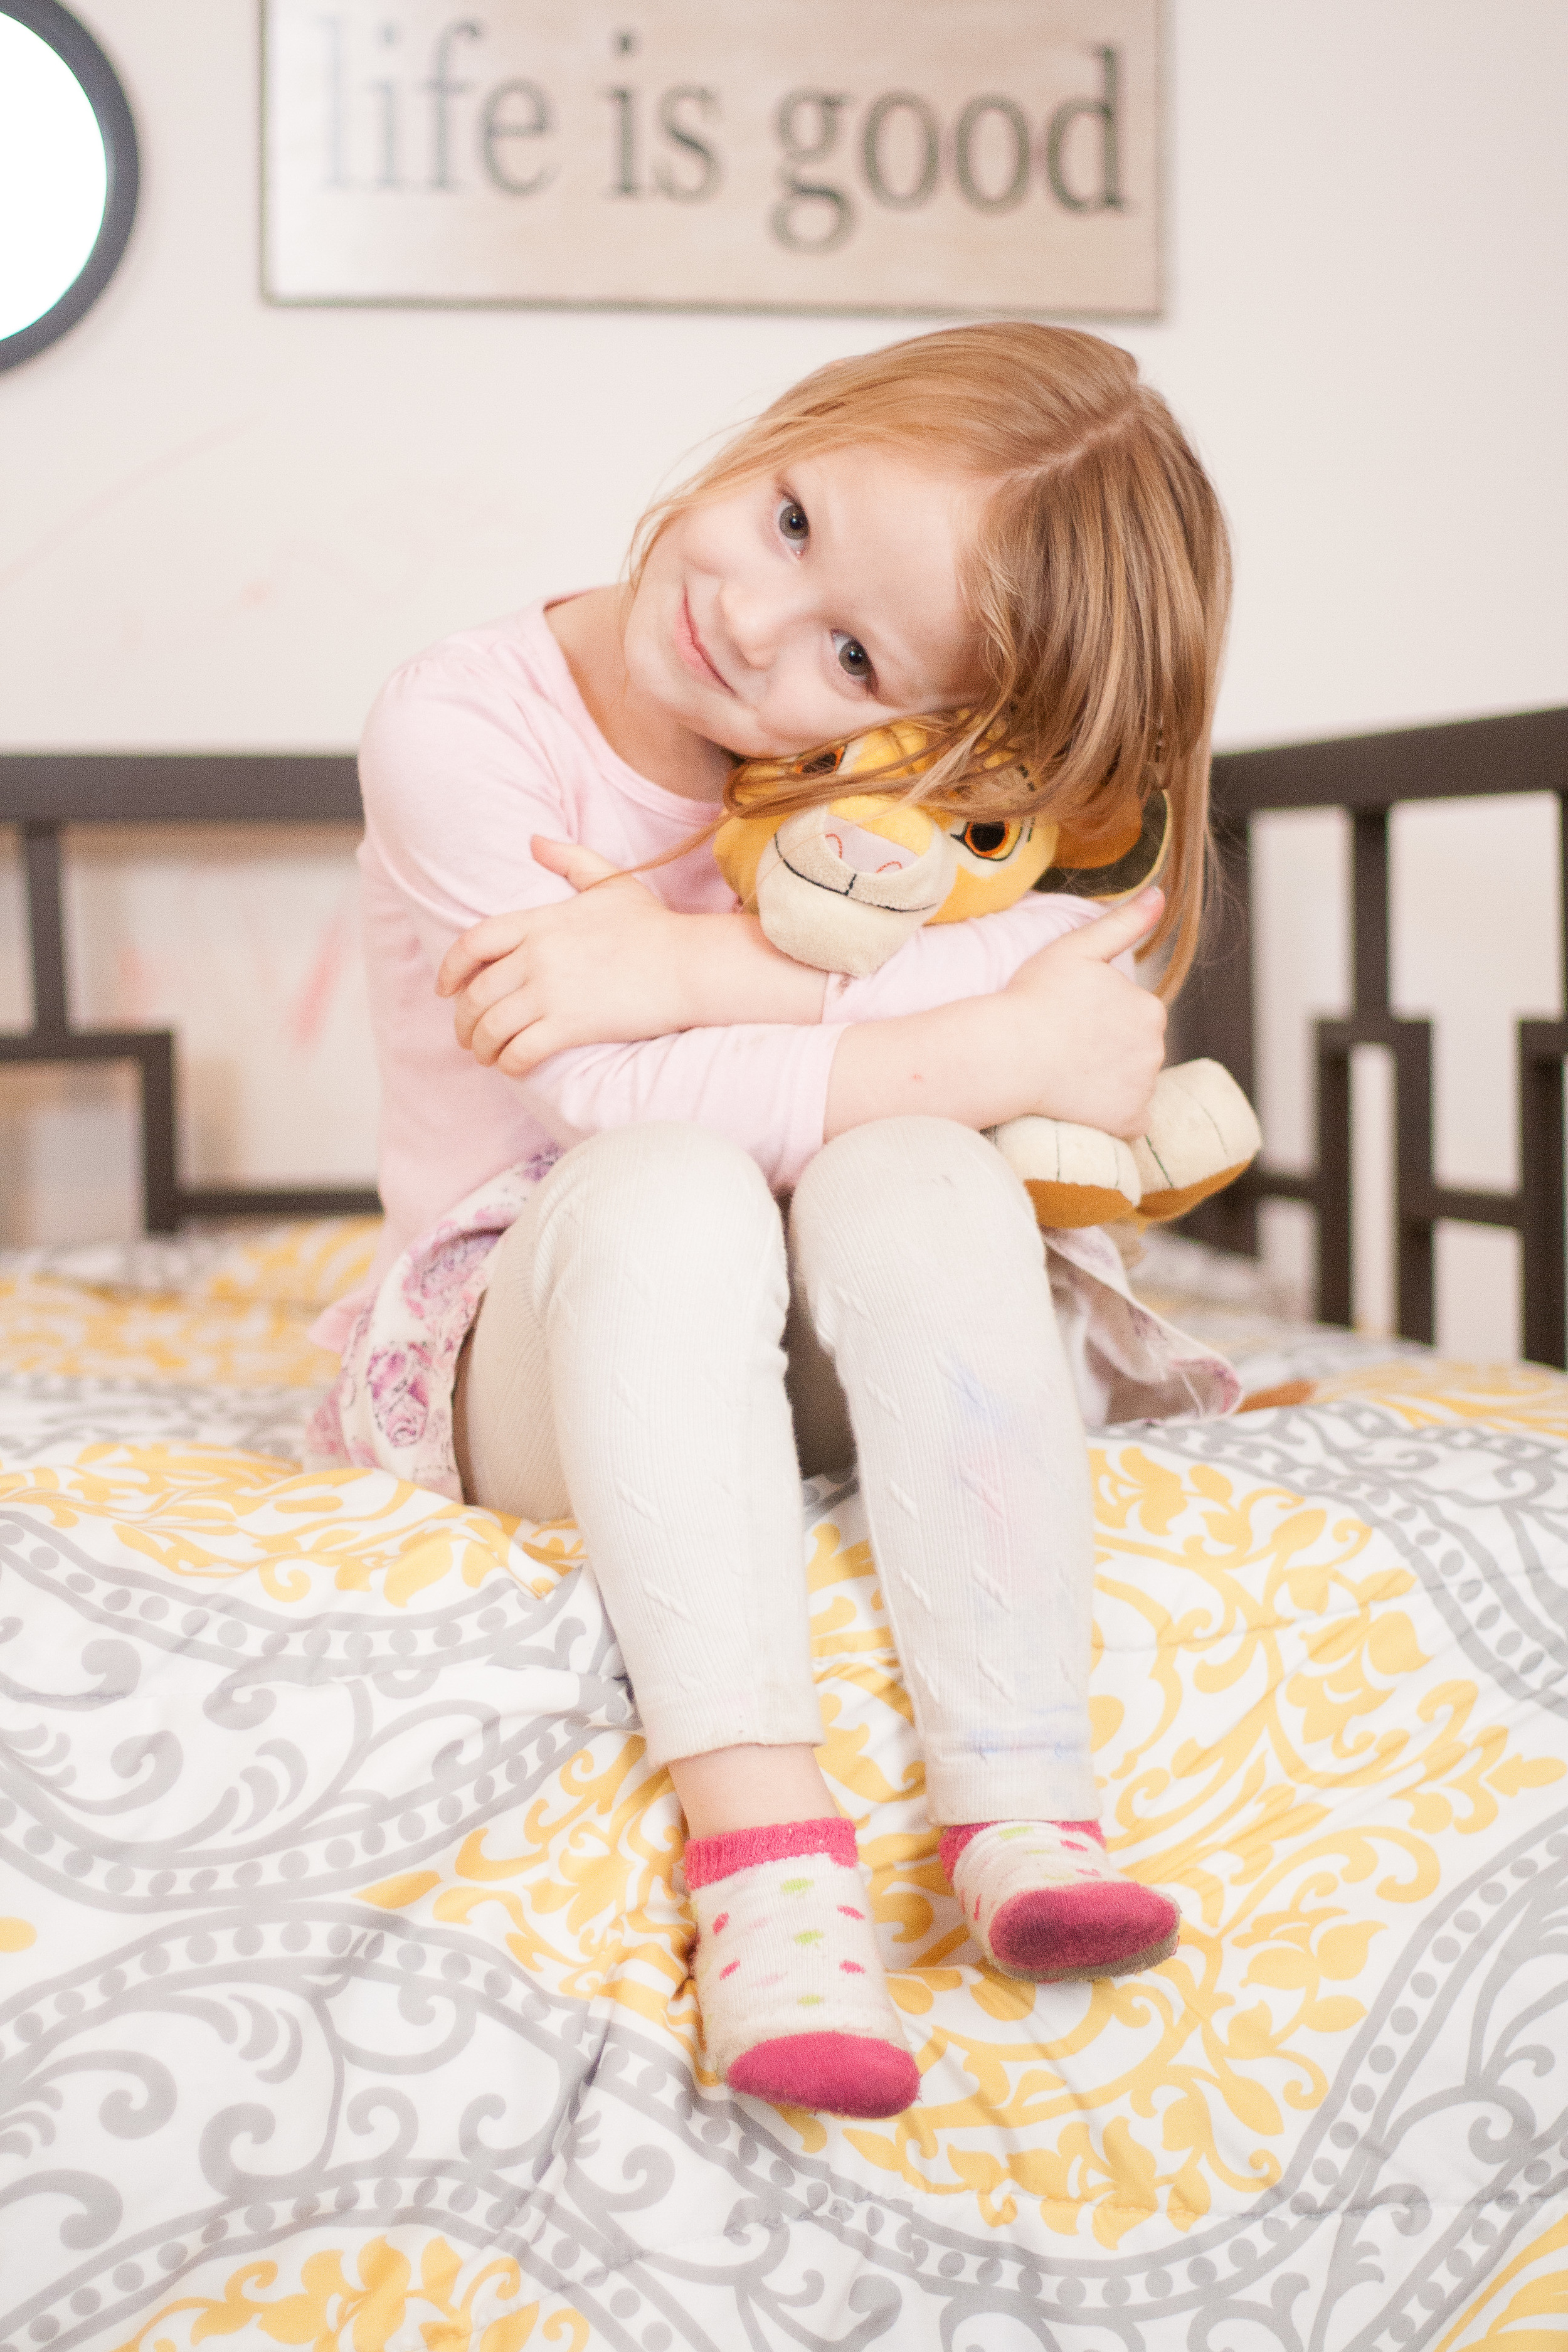 Candid Child snuggling stuffed animal